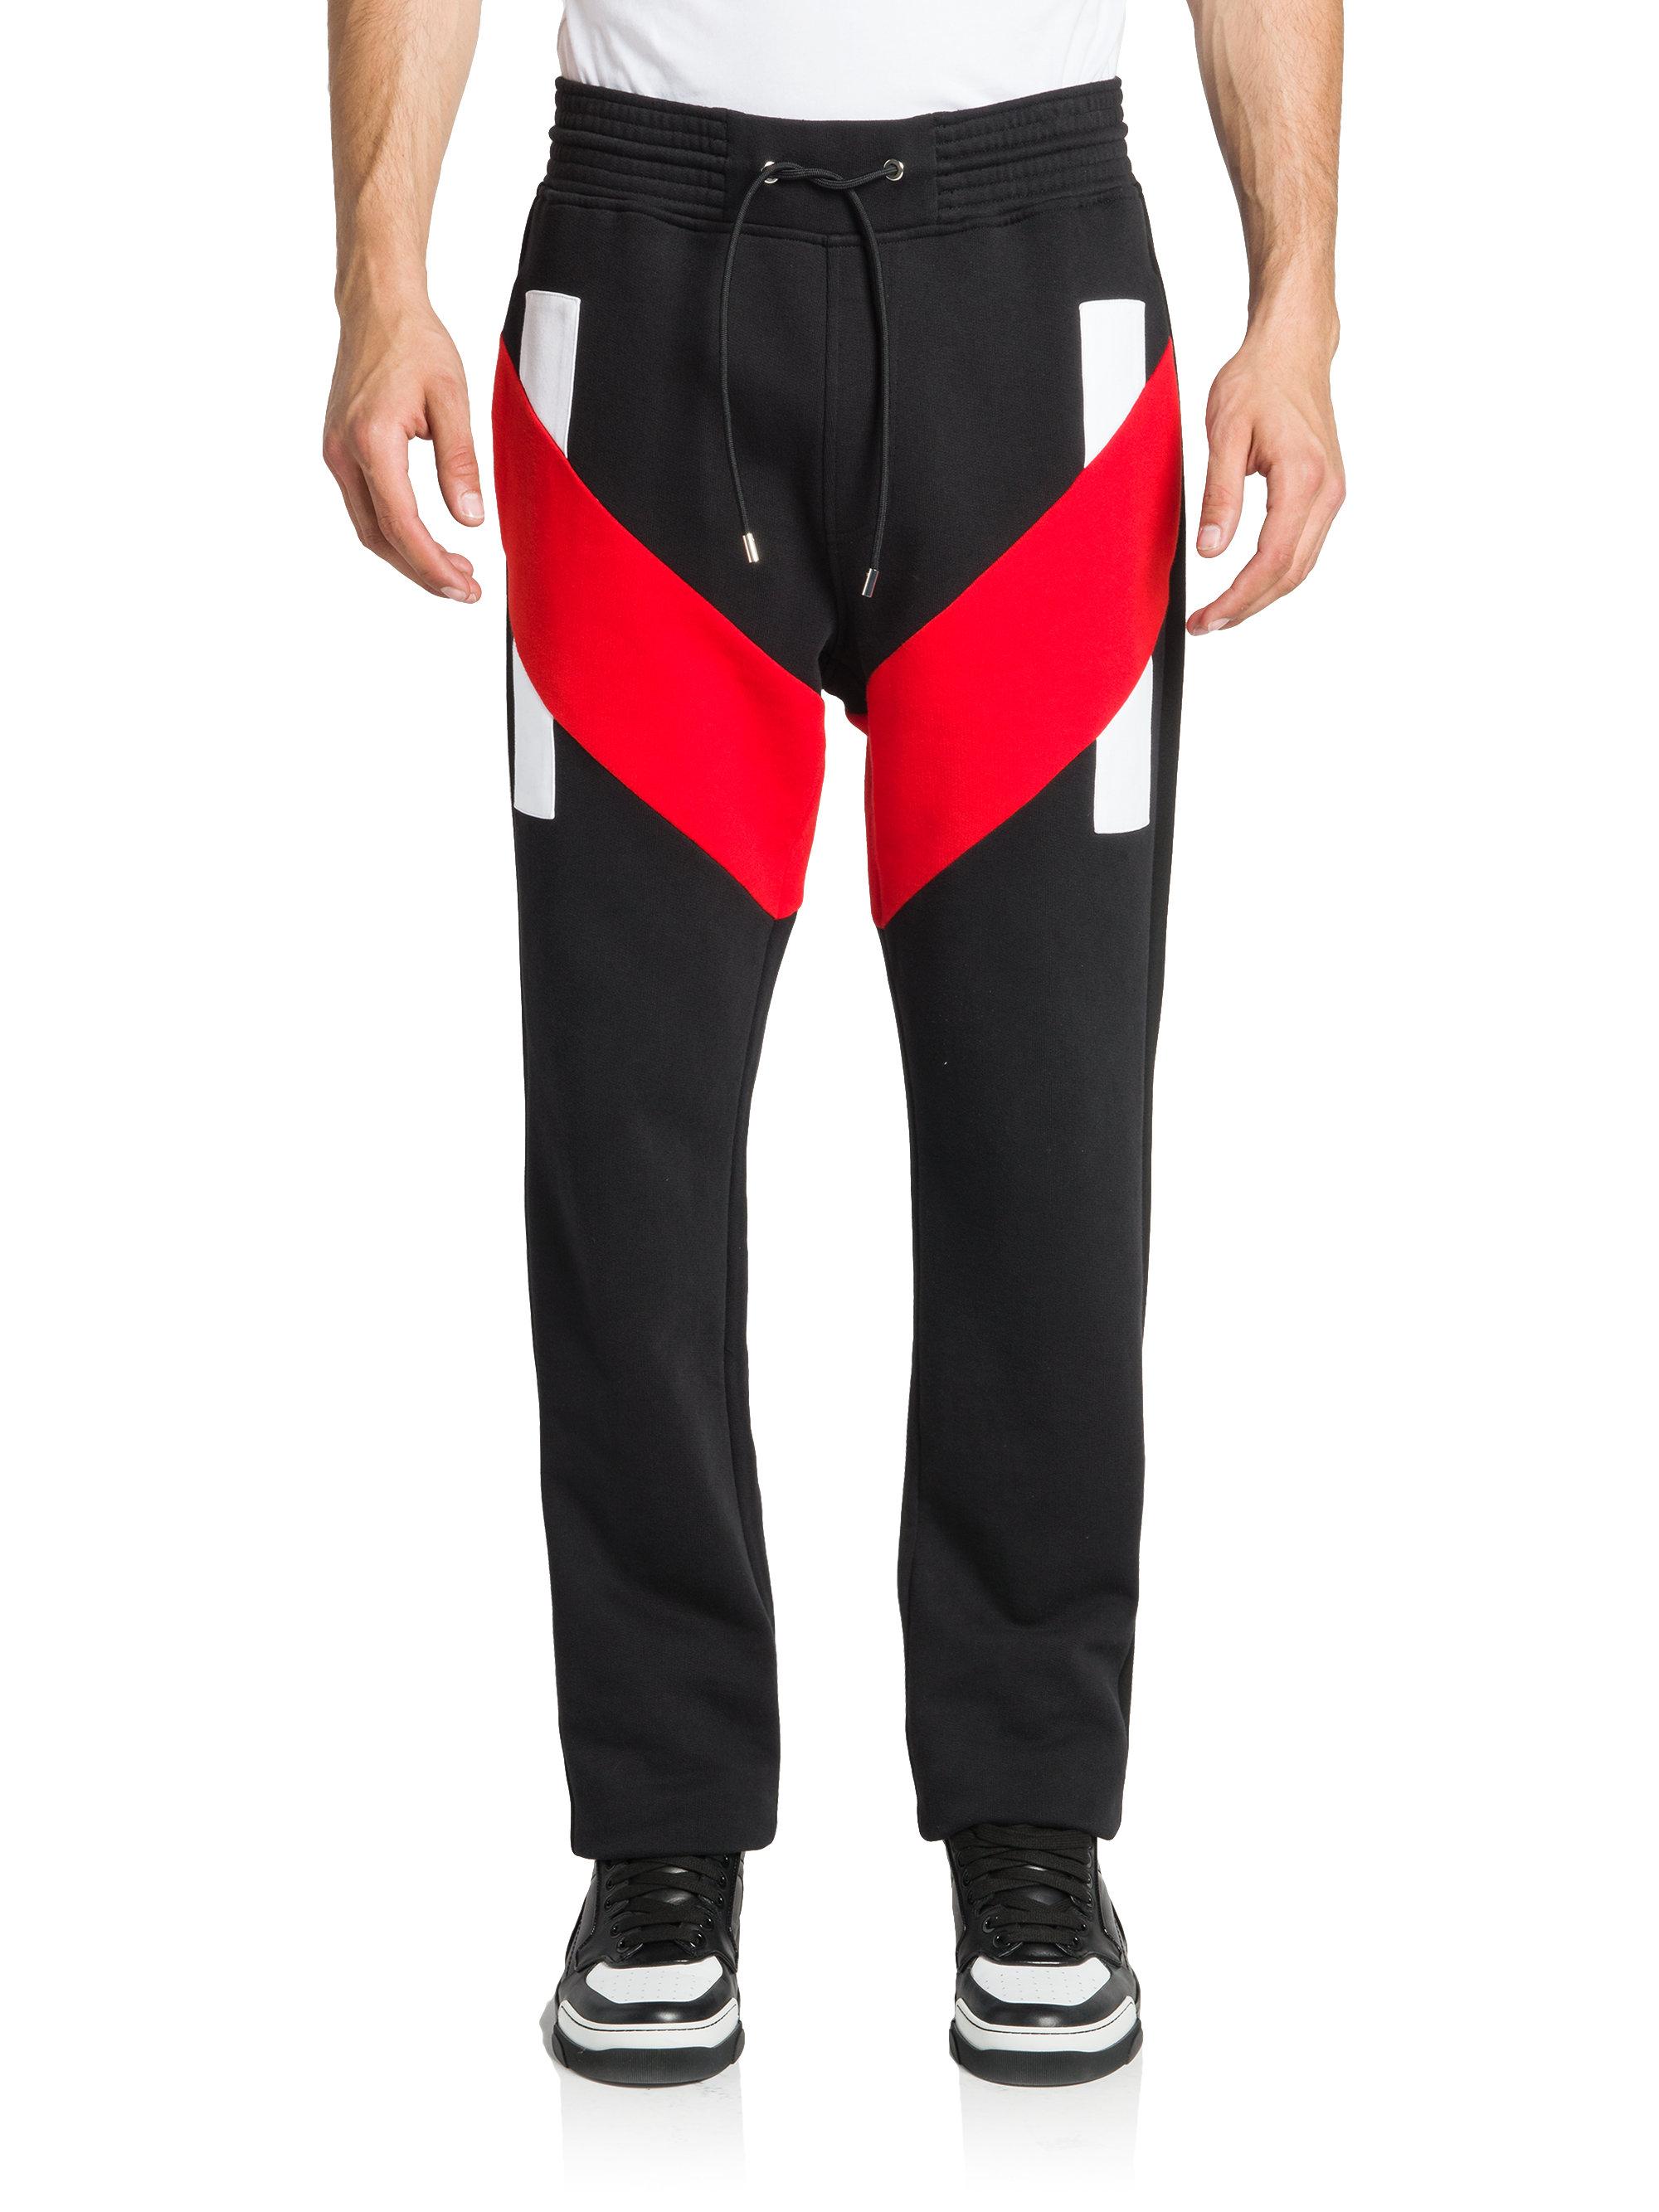 Mens Logo Fleece Track Pants Givenchy Pre Order For Sale Wide Range Of Sale Online EpuVDrsfwX